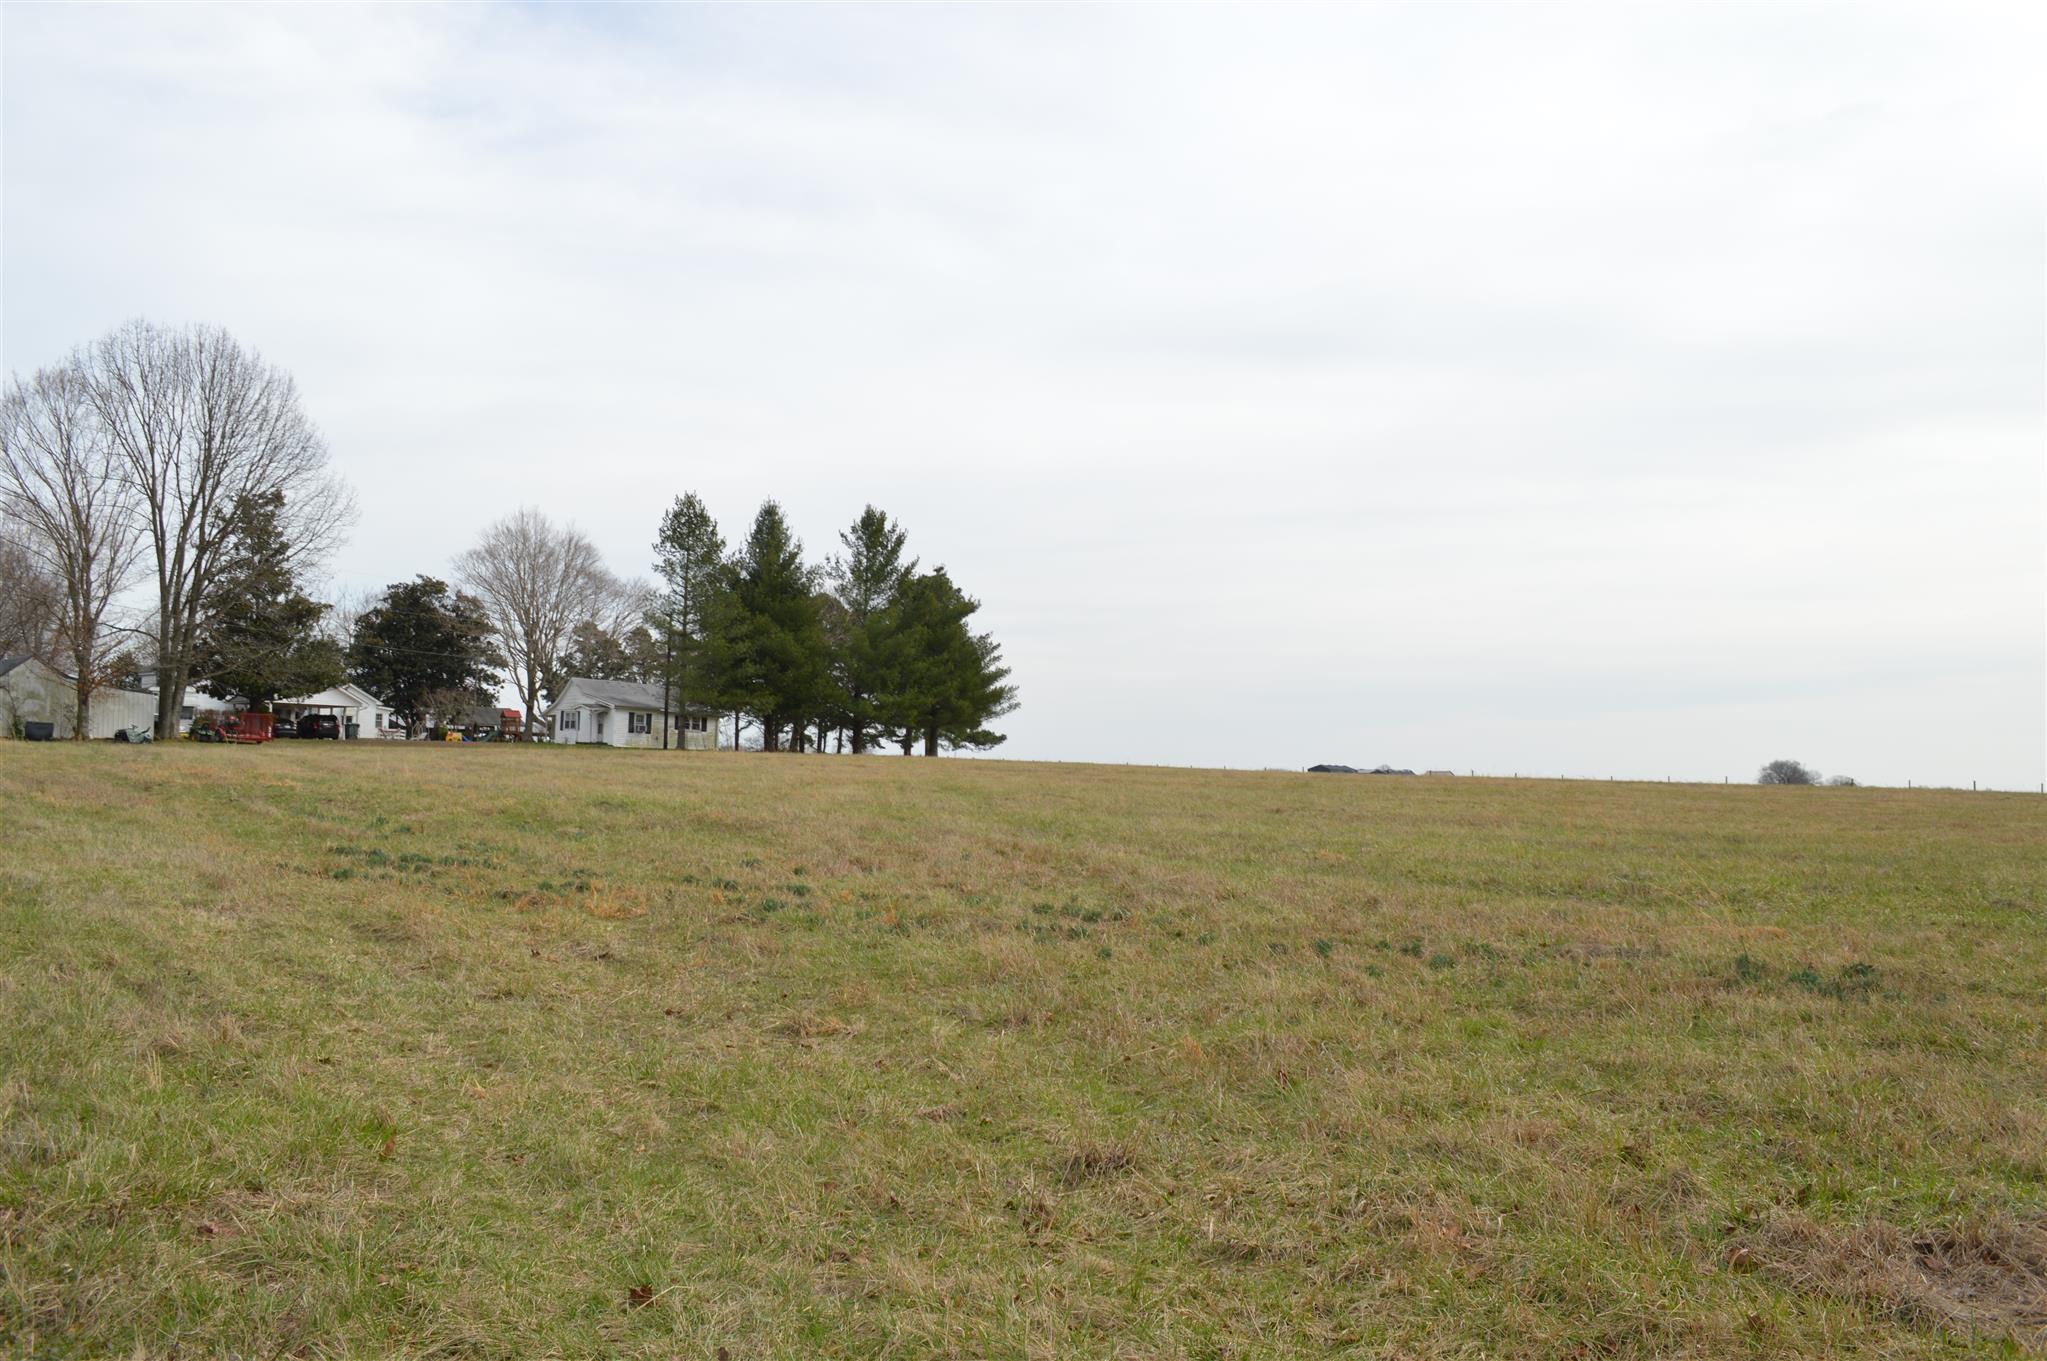 0 Old Dover Rd, Woodlawn, TN 37191 - Woodlawn, TN real estate listing